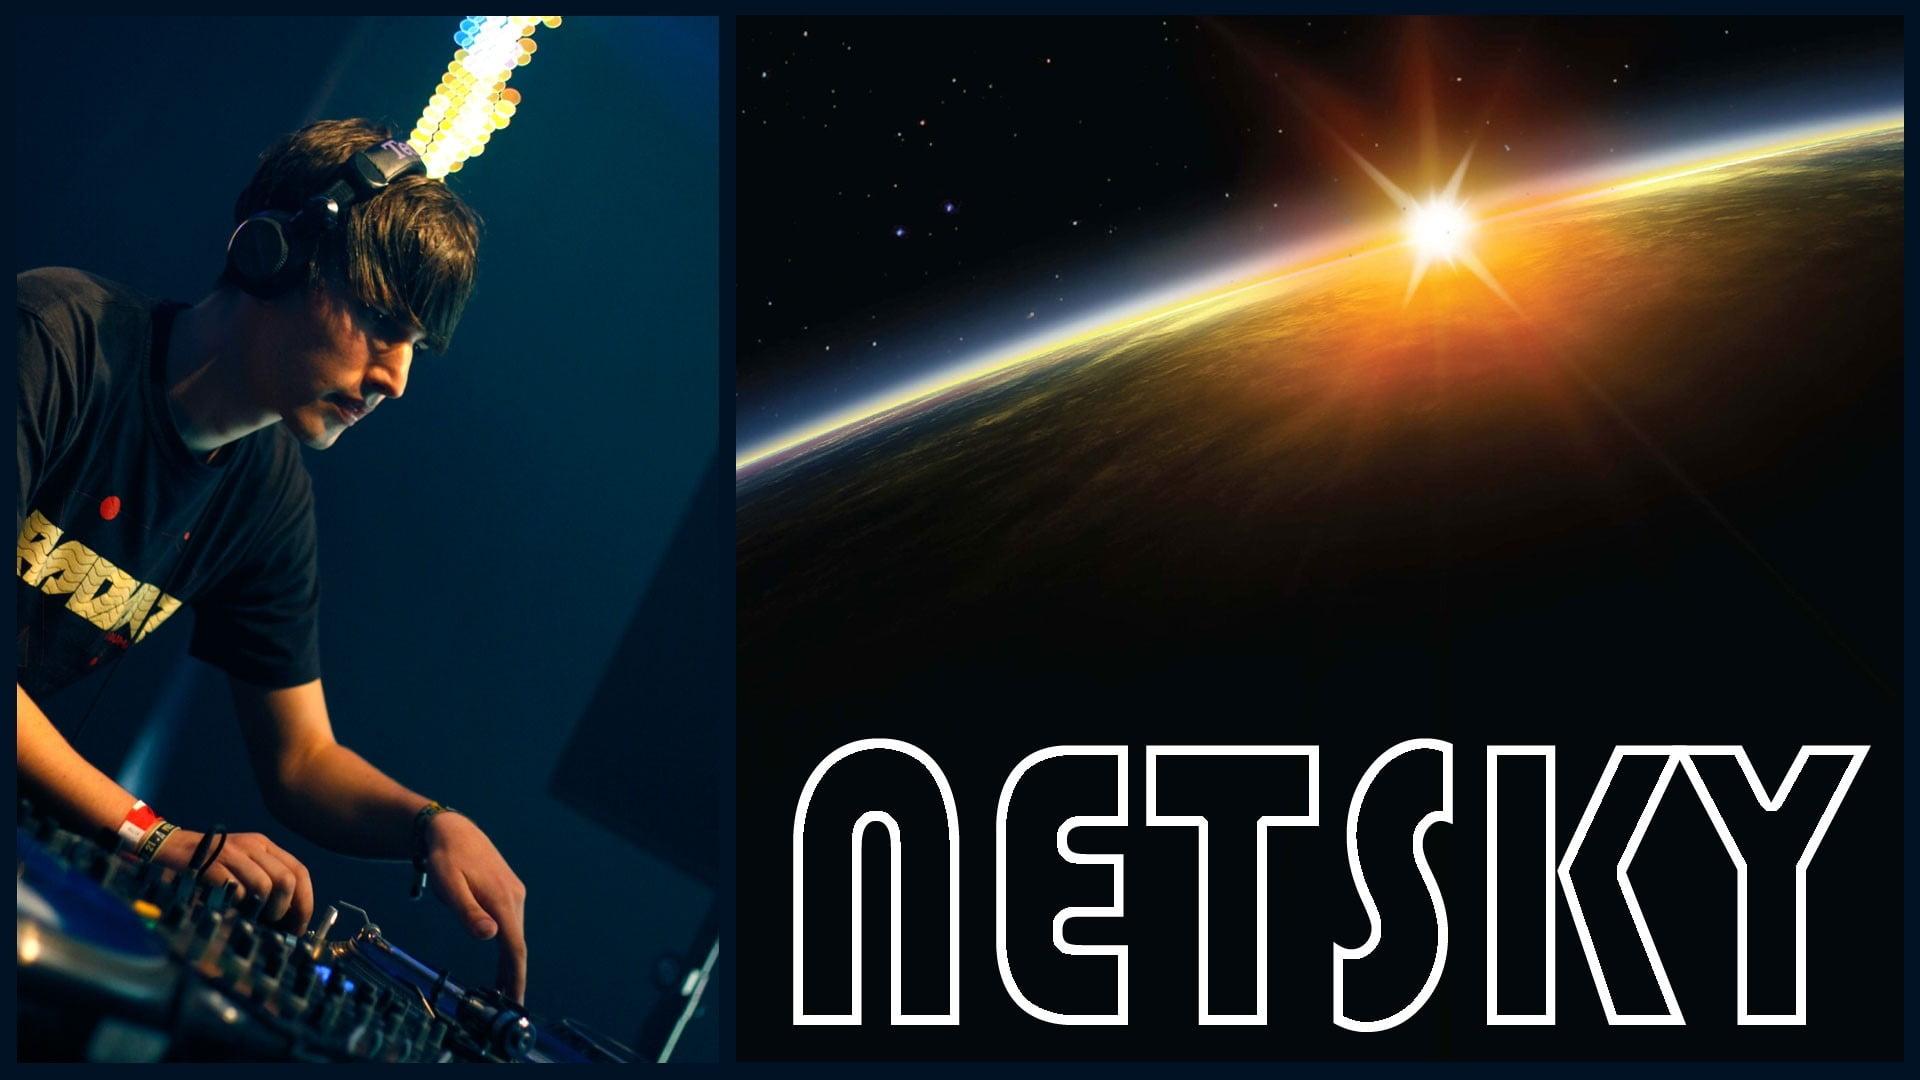 HD wallpaper Netsky Man Earth Sun Space one person night 1920x1080